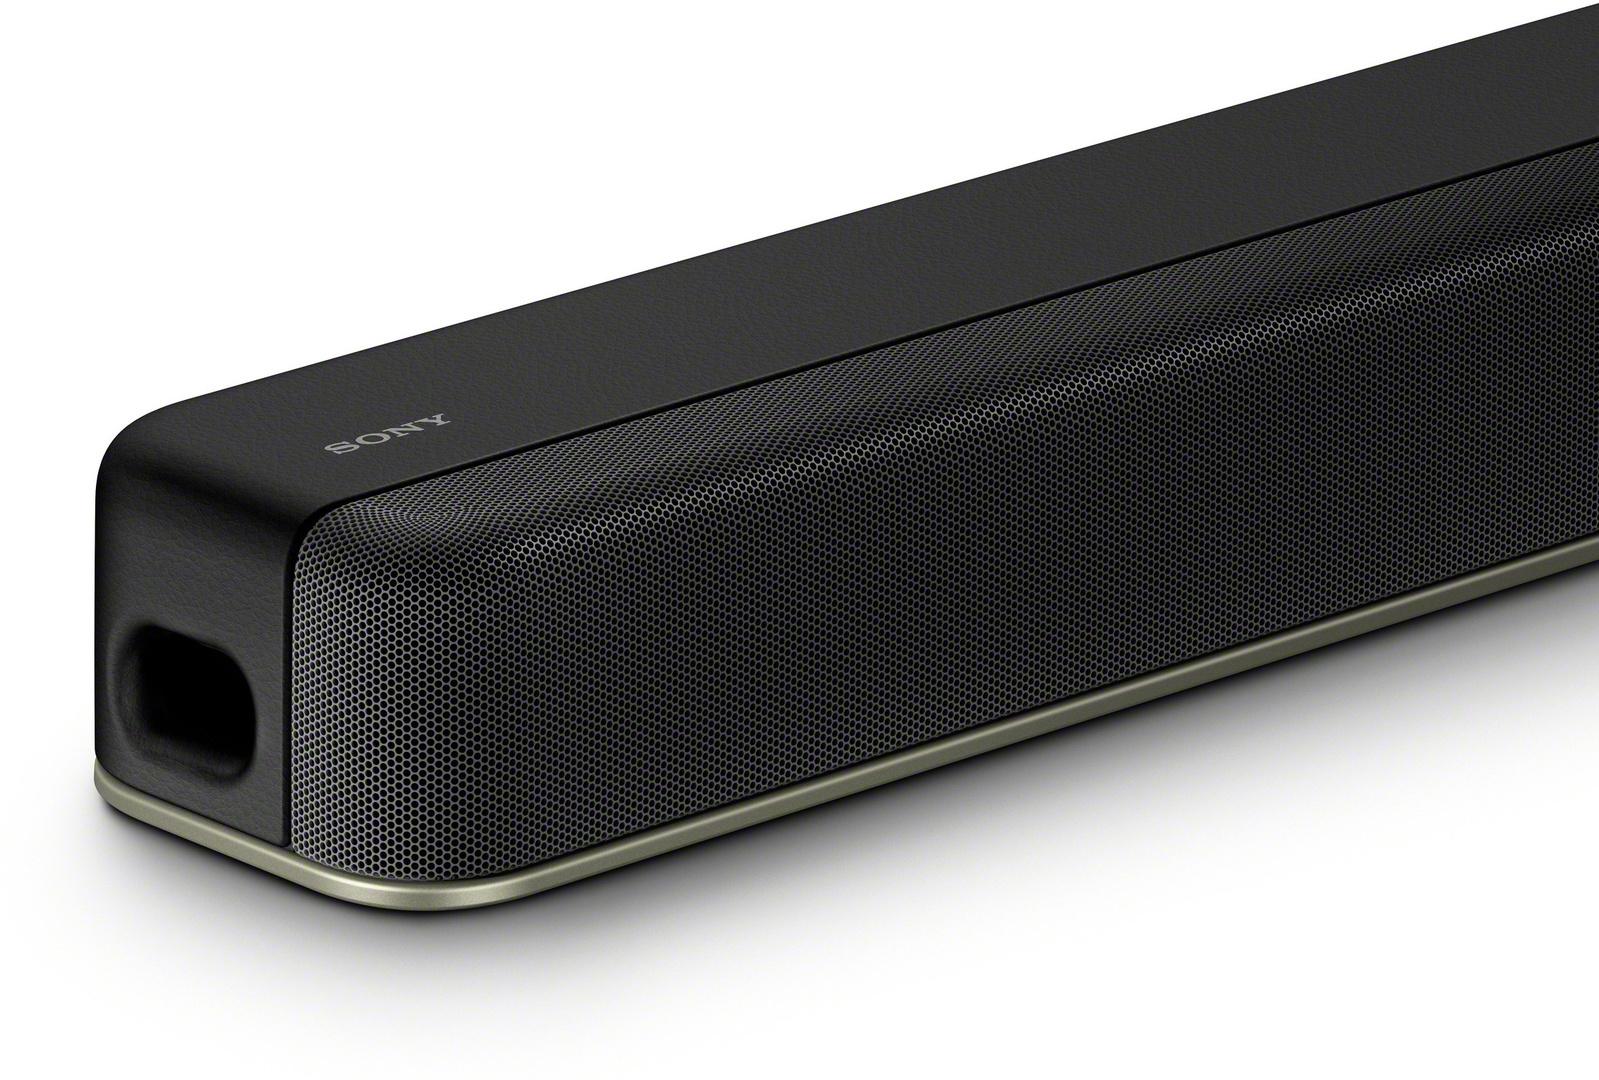 Sony Introduceert De HT-X8500 Dolby Atmos Soundbar